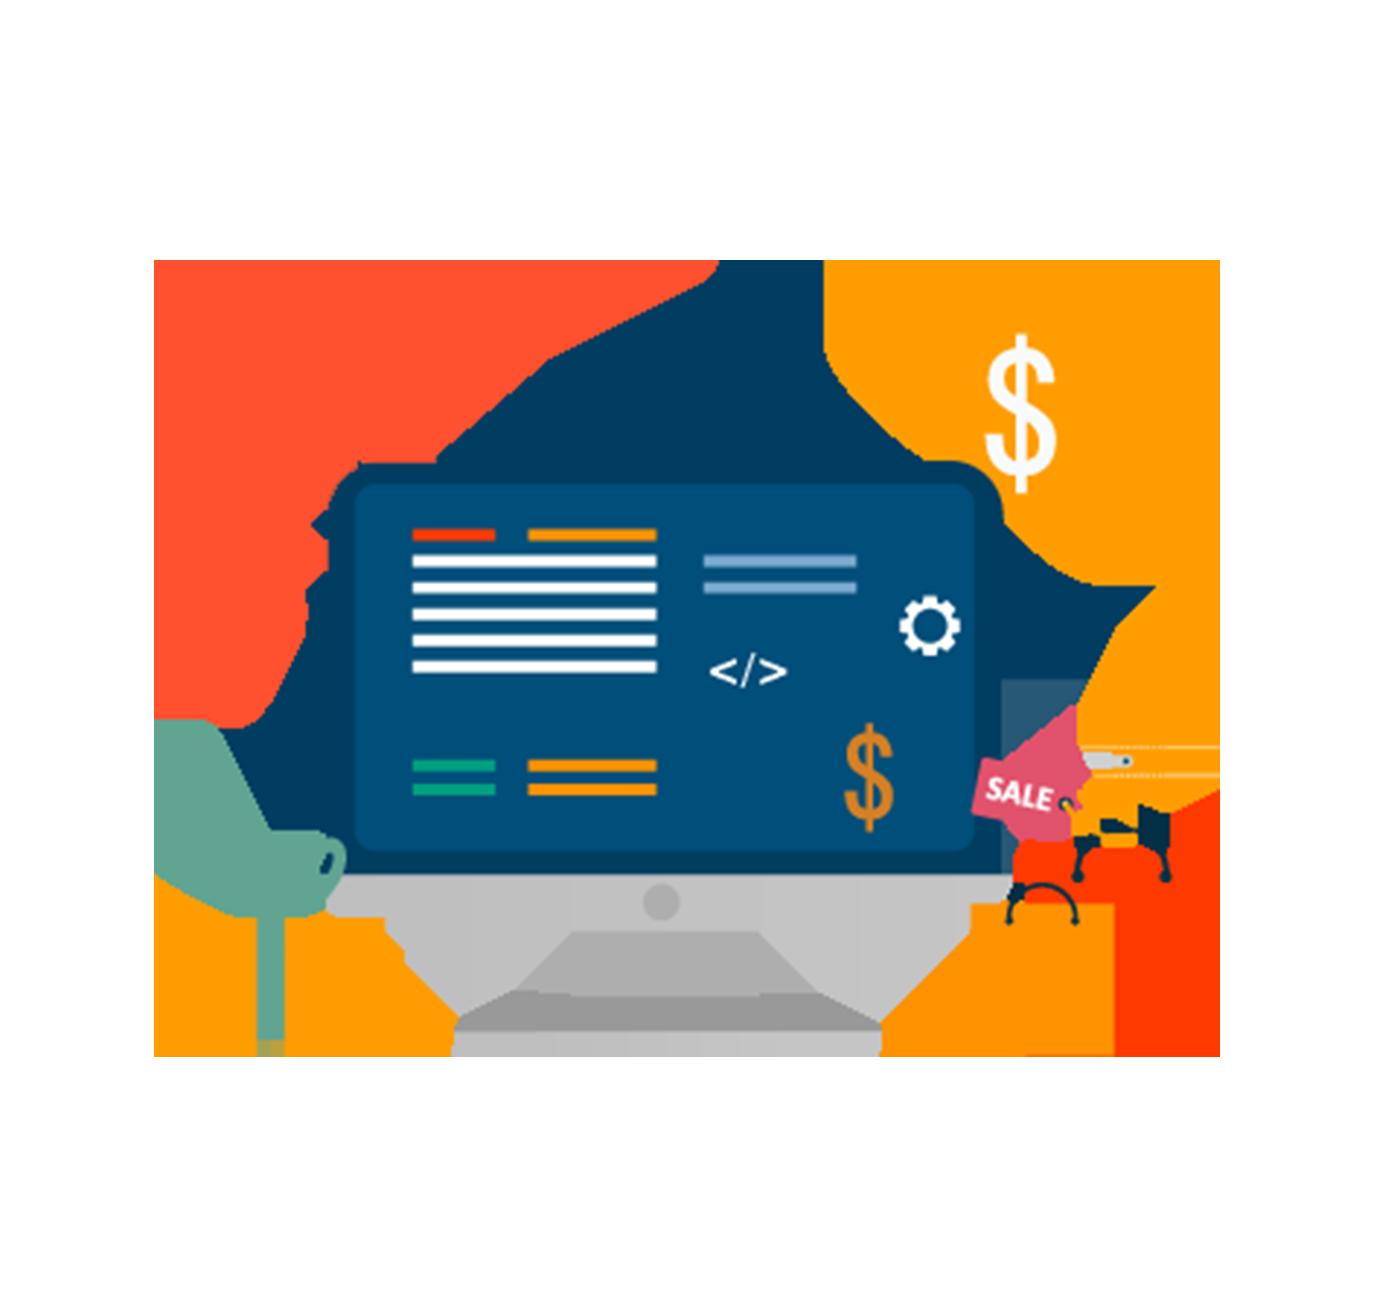 ecommerce website development company in pune india